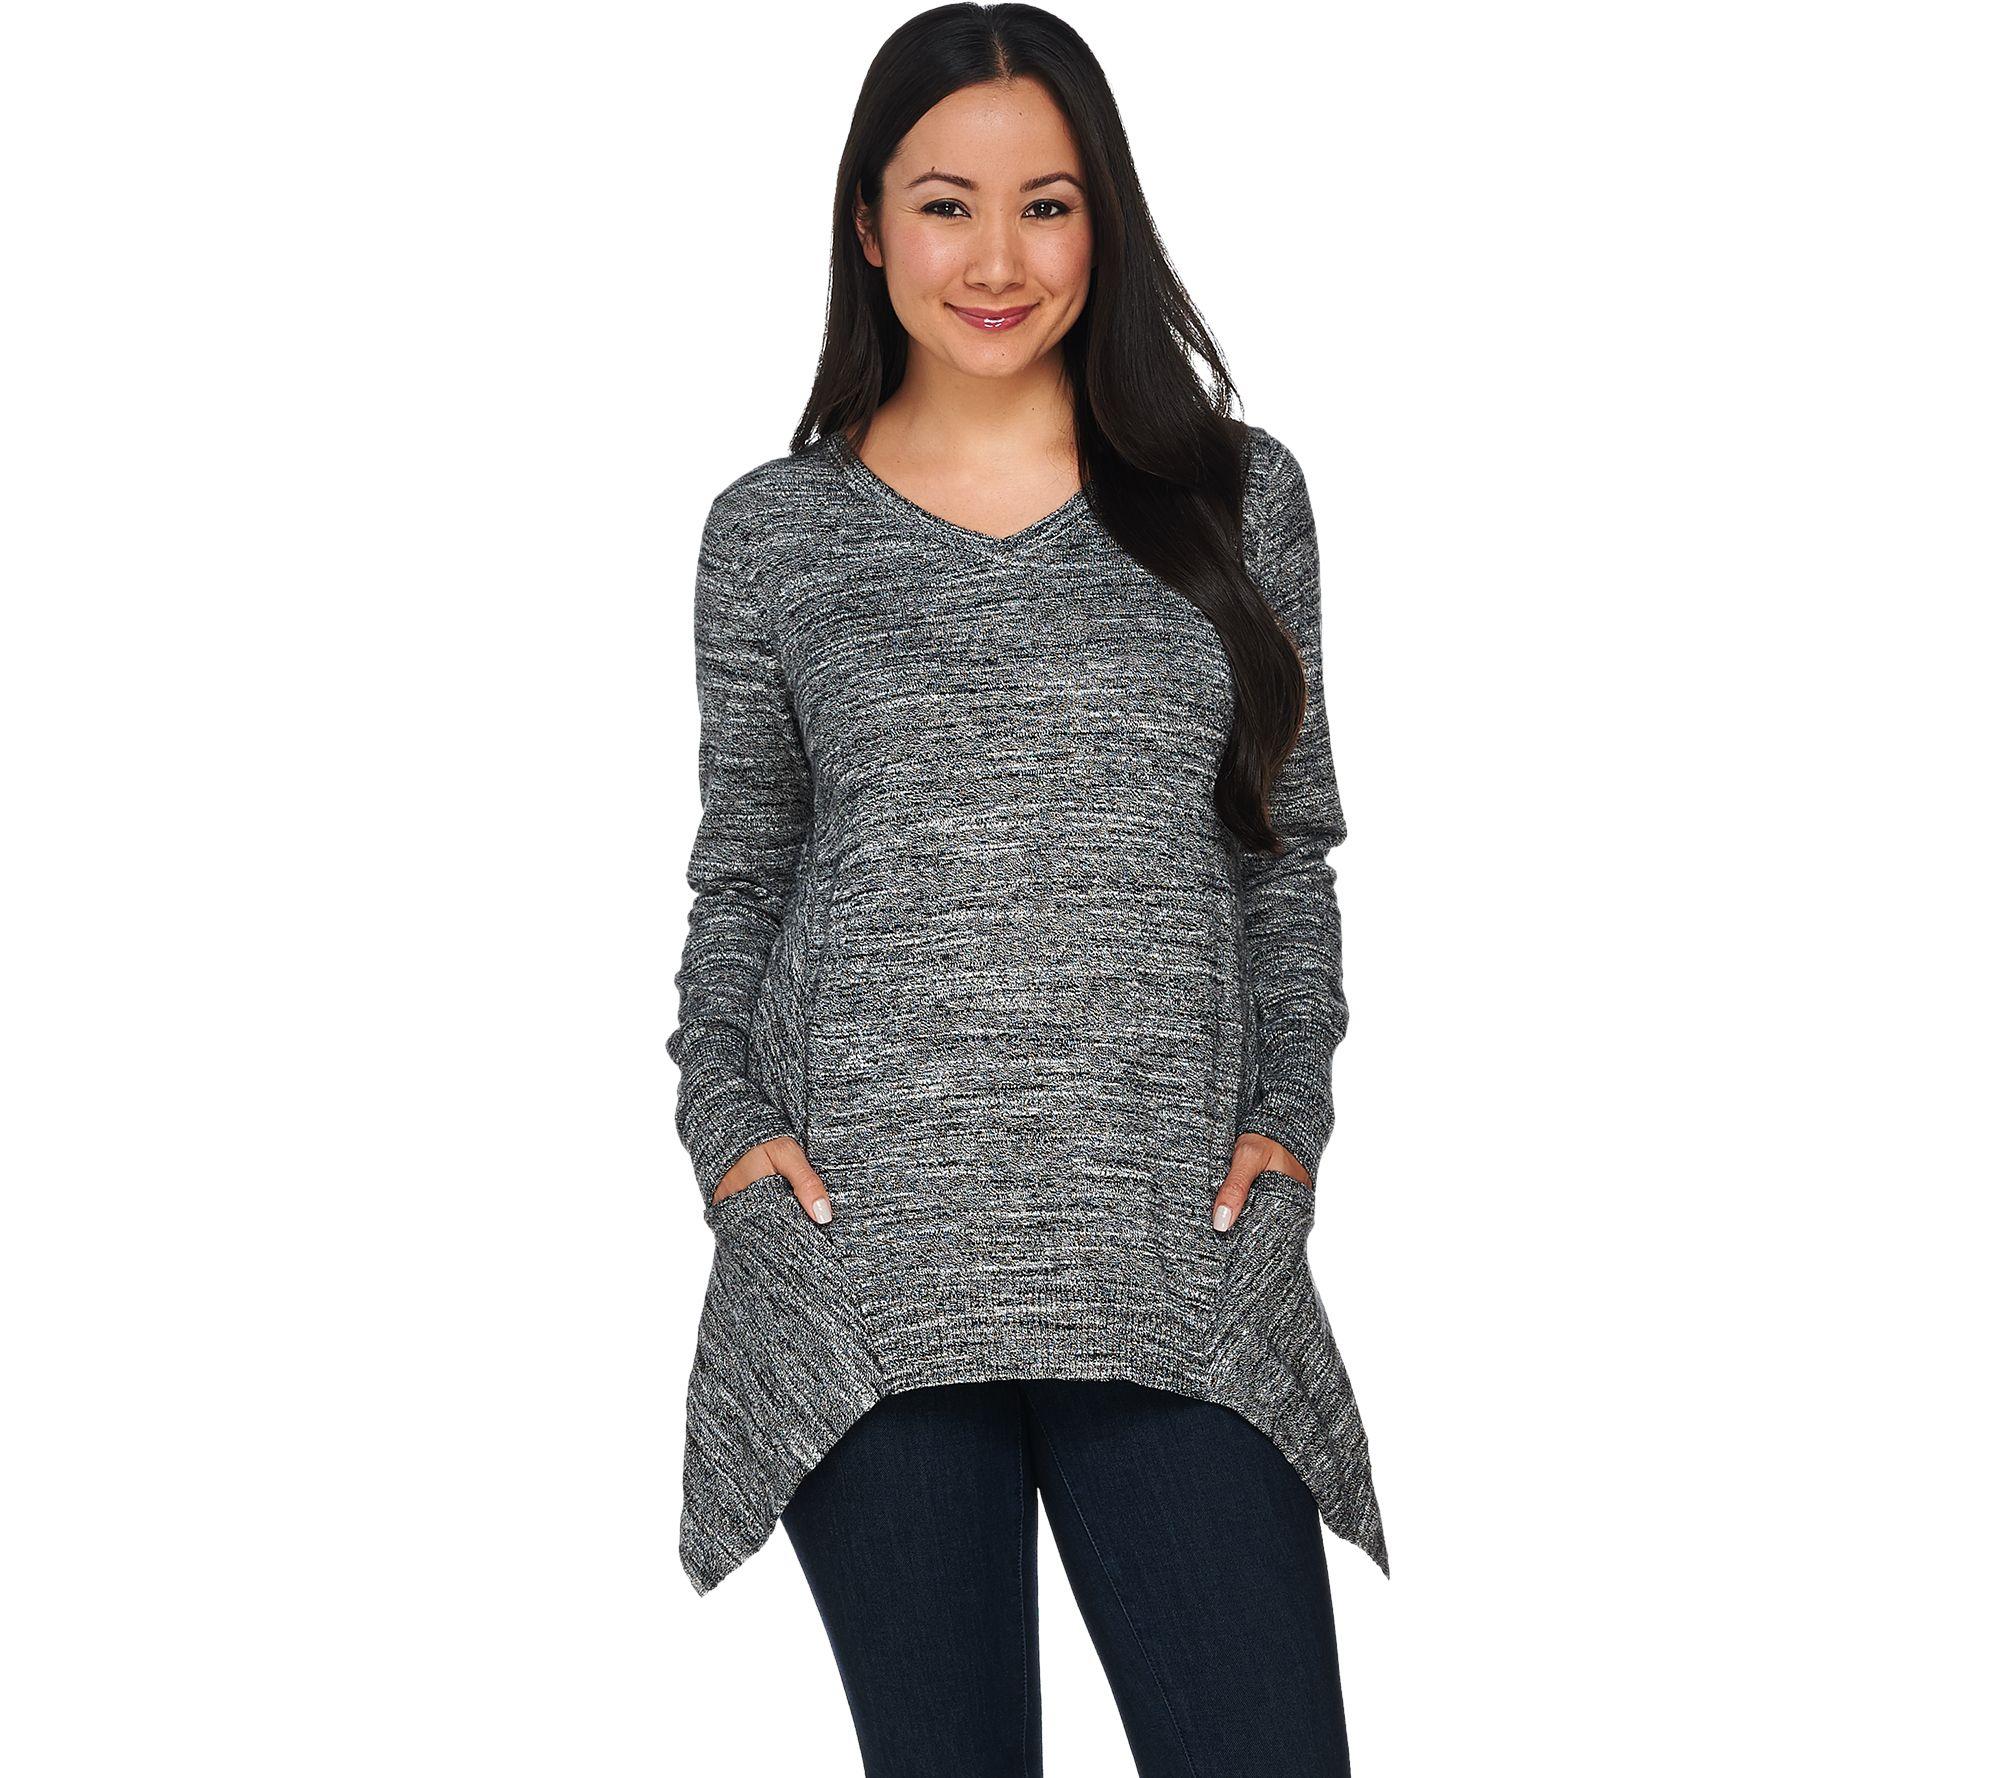 logo by lori goldstein melange cotton cashmere sweater. Black Bedroom Furniture Sets. Home Design Ideas